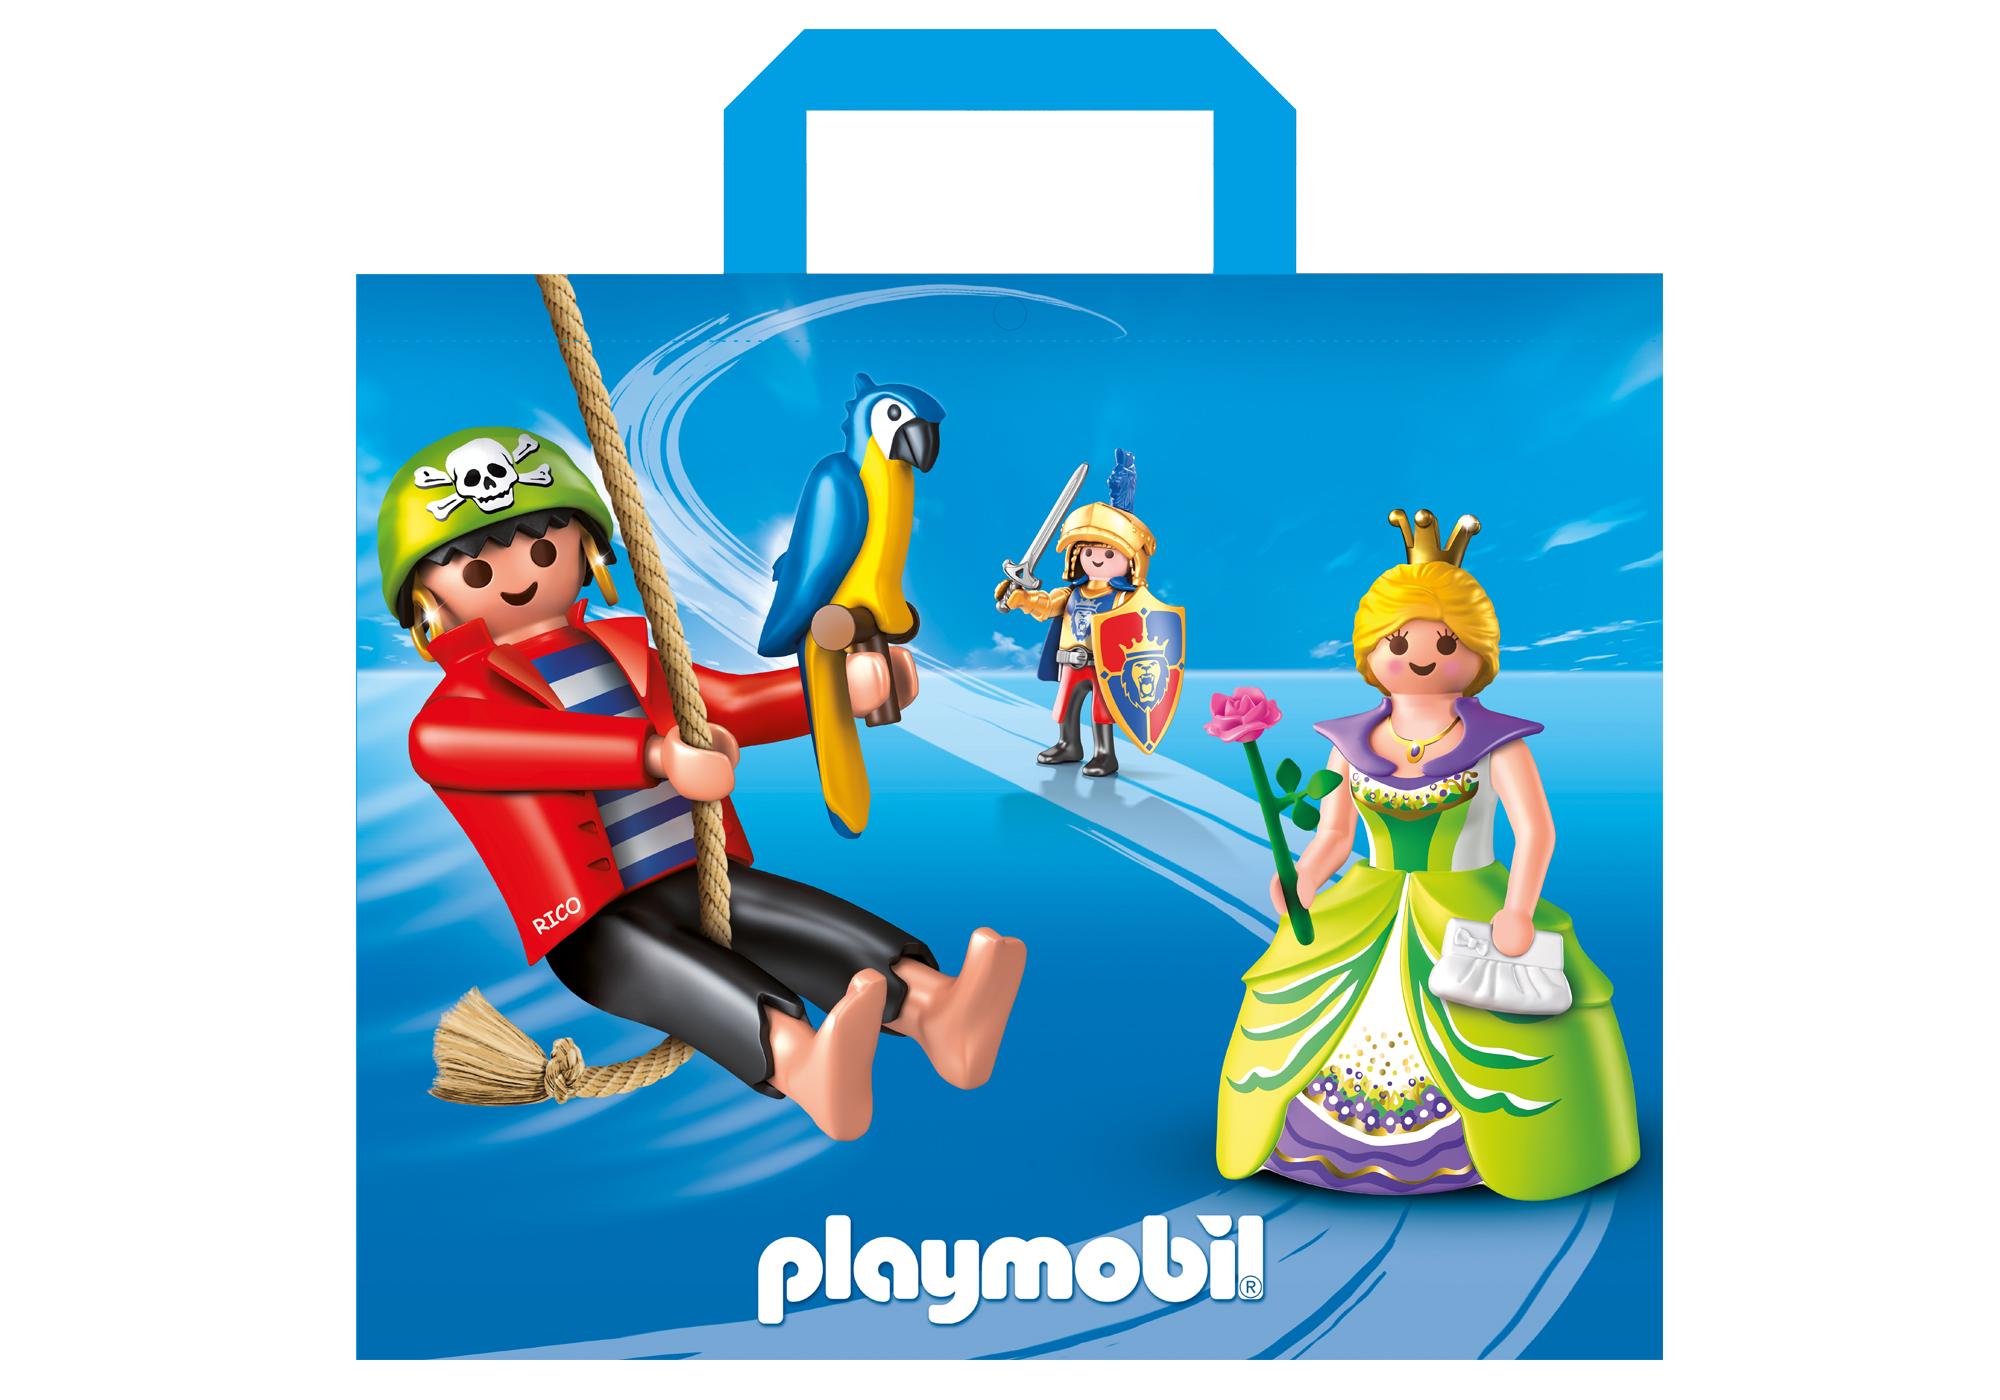 http://media.playmobil.com/i/playmobil/86489_product_detail/Sac PLAYMOBIL Large